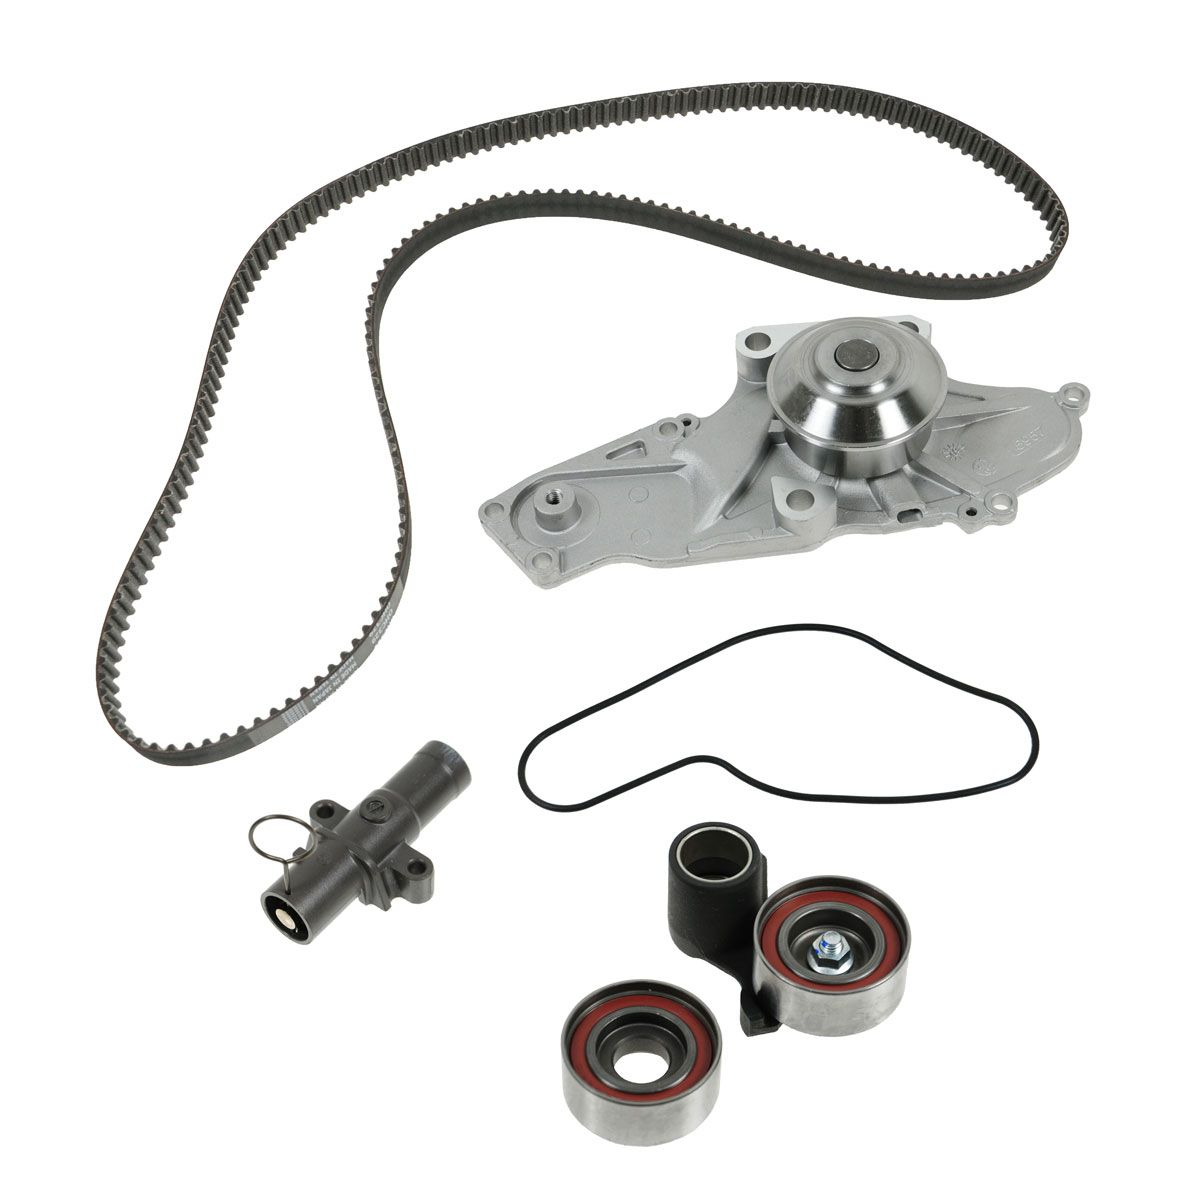 GATES Timing Belt/Water Pump Kit For Accord TL MDX Pickup